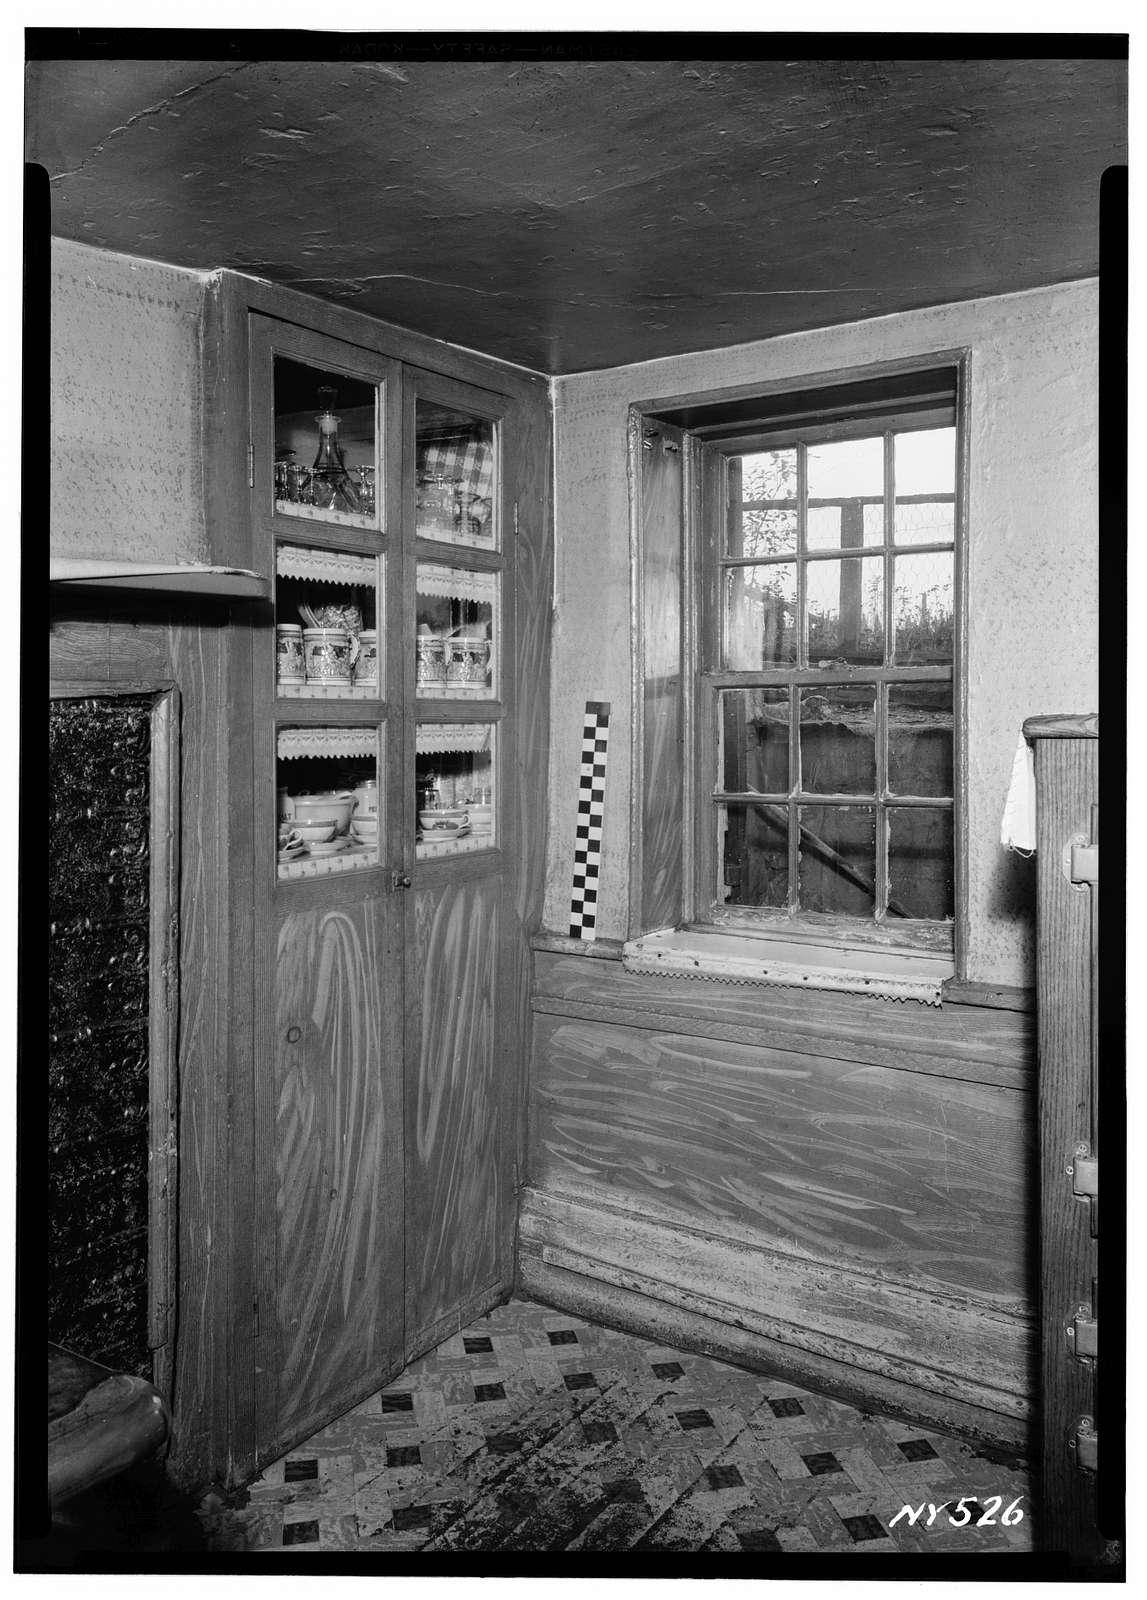 Wyckoff Farmhand House, 1306 Flushing Avenue, Ridgewood, Queens County, NY